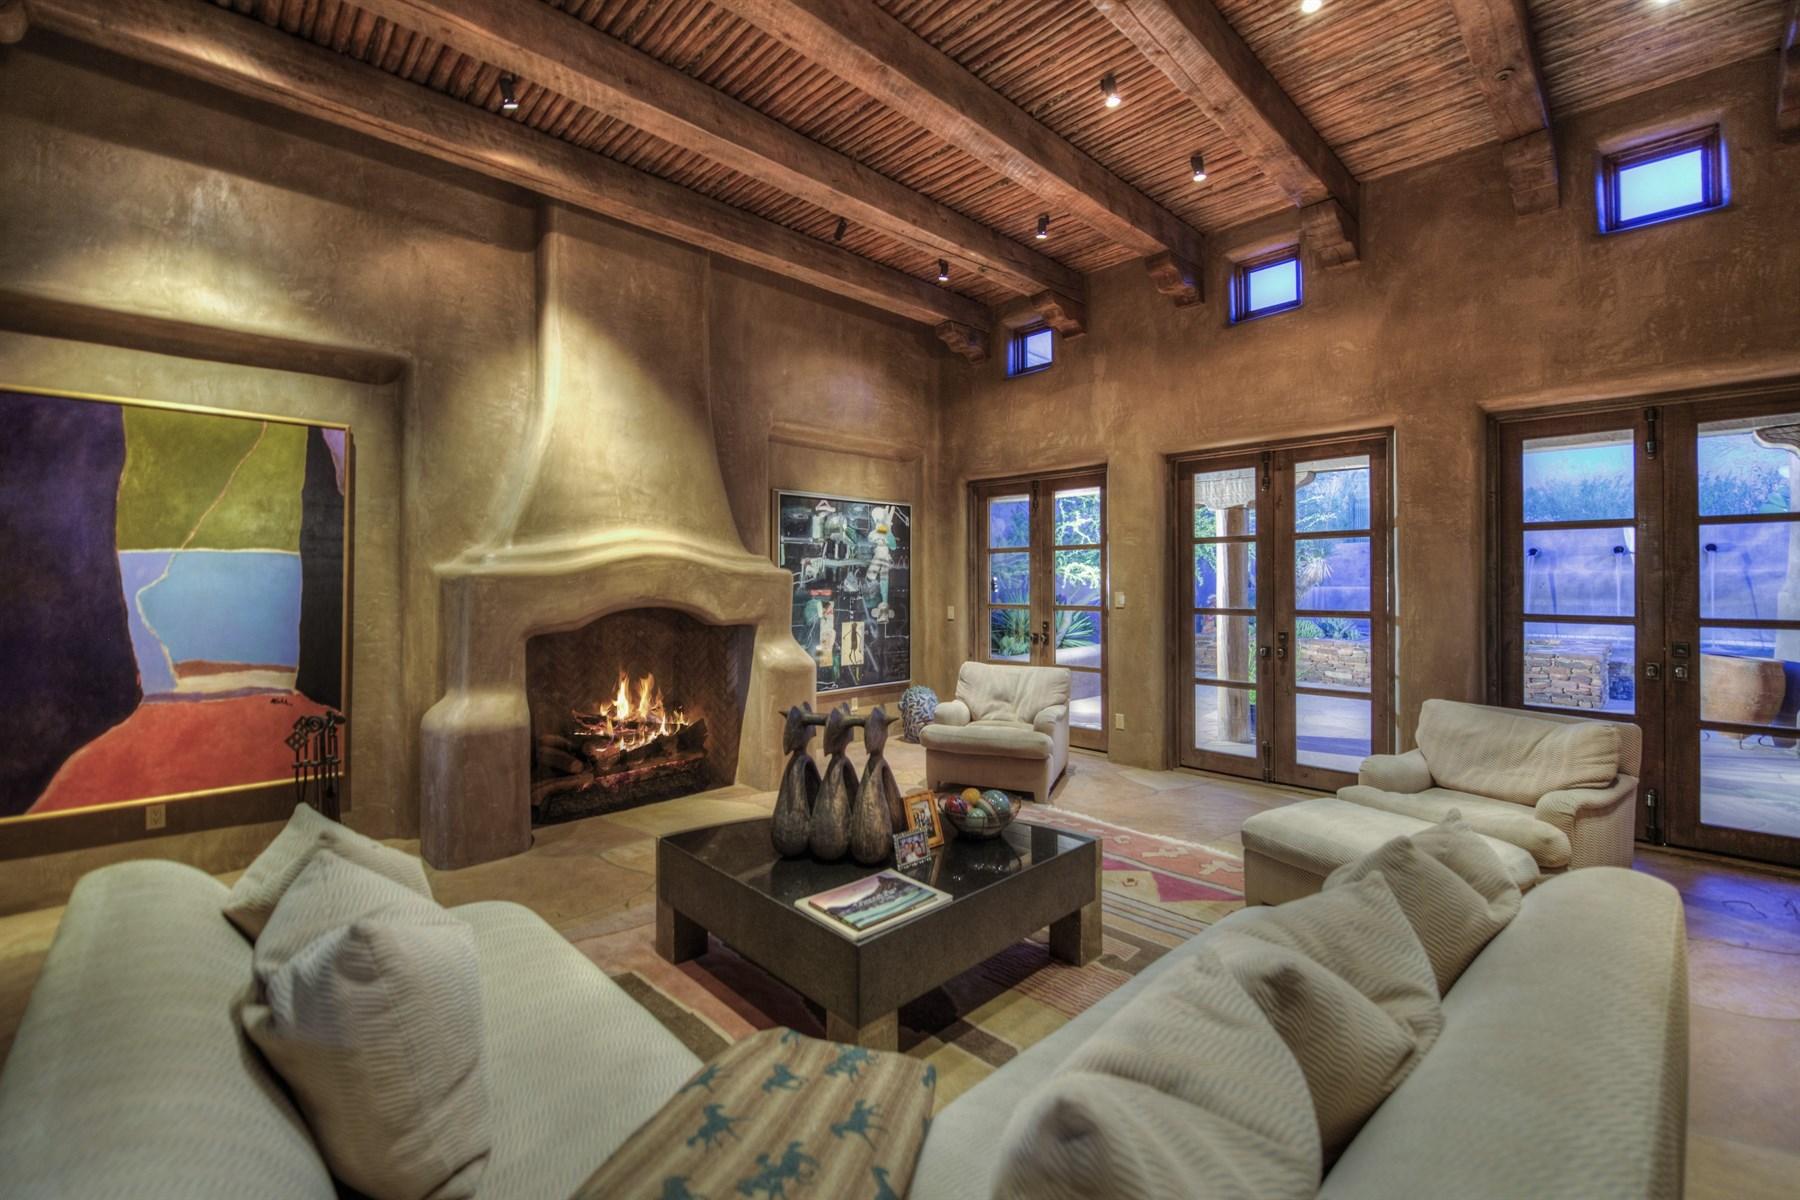 独户住宅 为 销售 在 Elegant Pueblo Revival home, masterfully designed by architect German Robledo 10040 E Happy Valley Rd 18 斯科茨代尔, 亚利桑那州 85255 美国